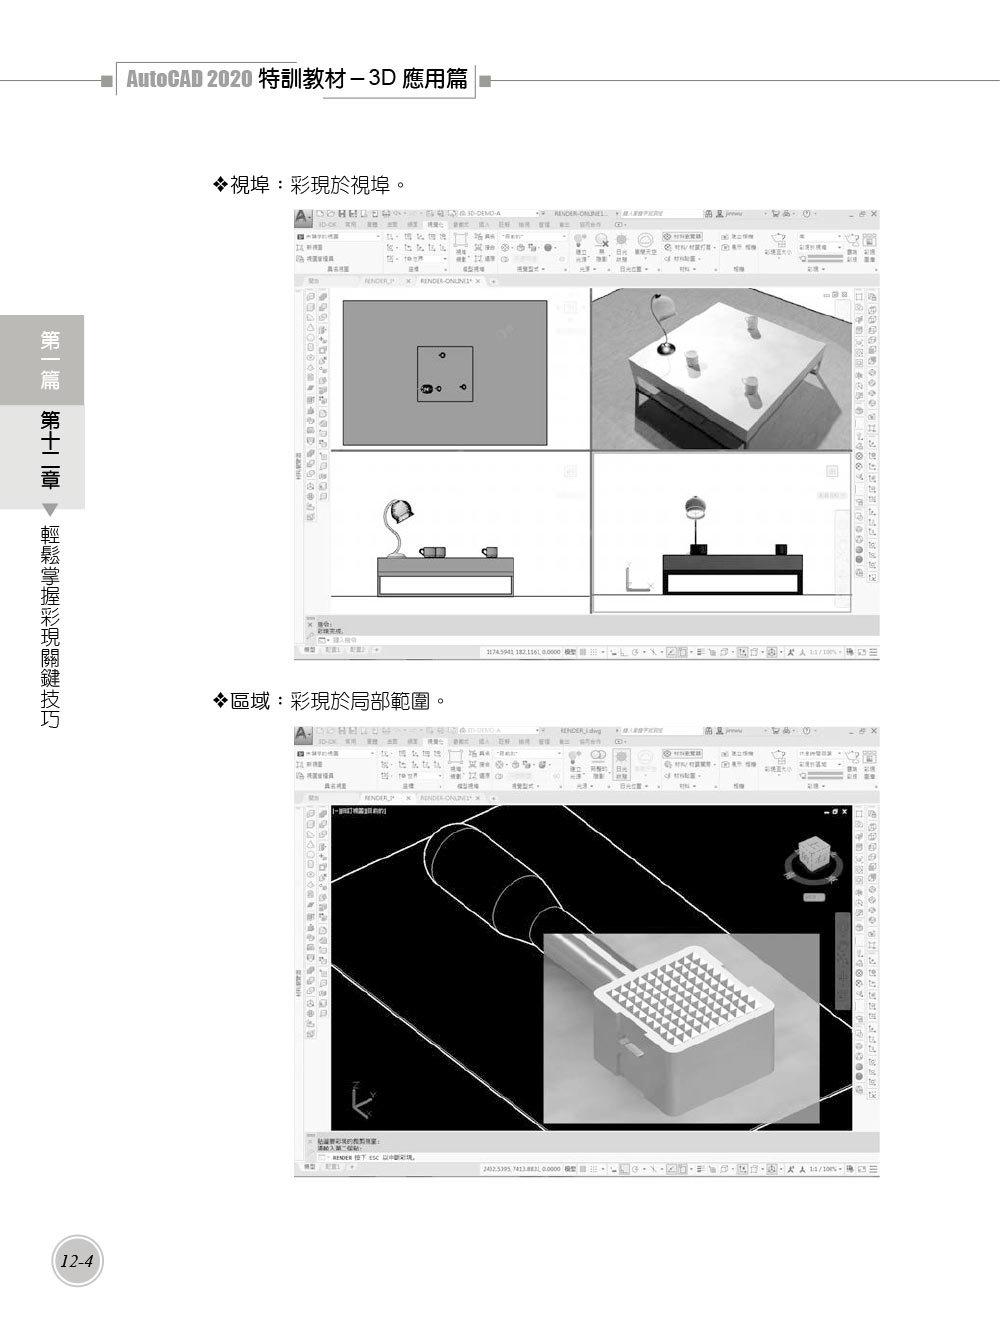 TQC+ AutoCAD 2020 特訓教材 -- 3D應用篇 (隨書附贈23個精彩3D動態教學檔)-preview-4